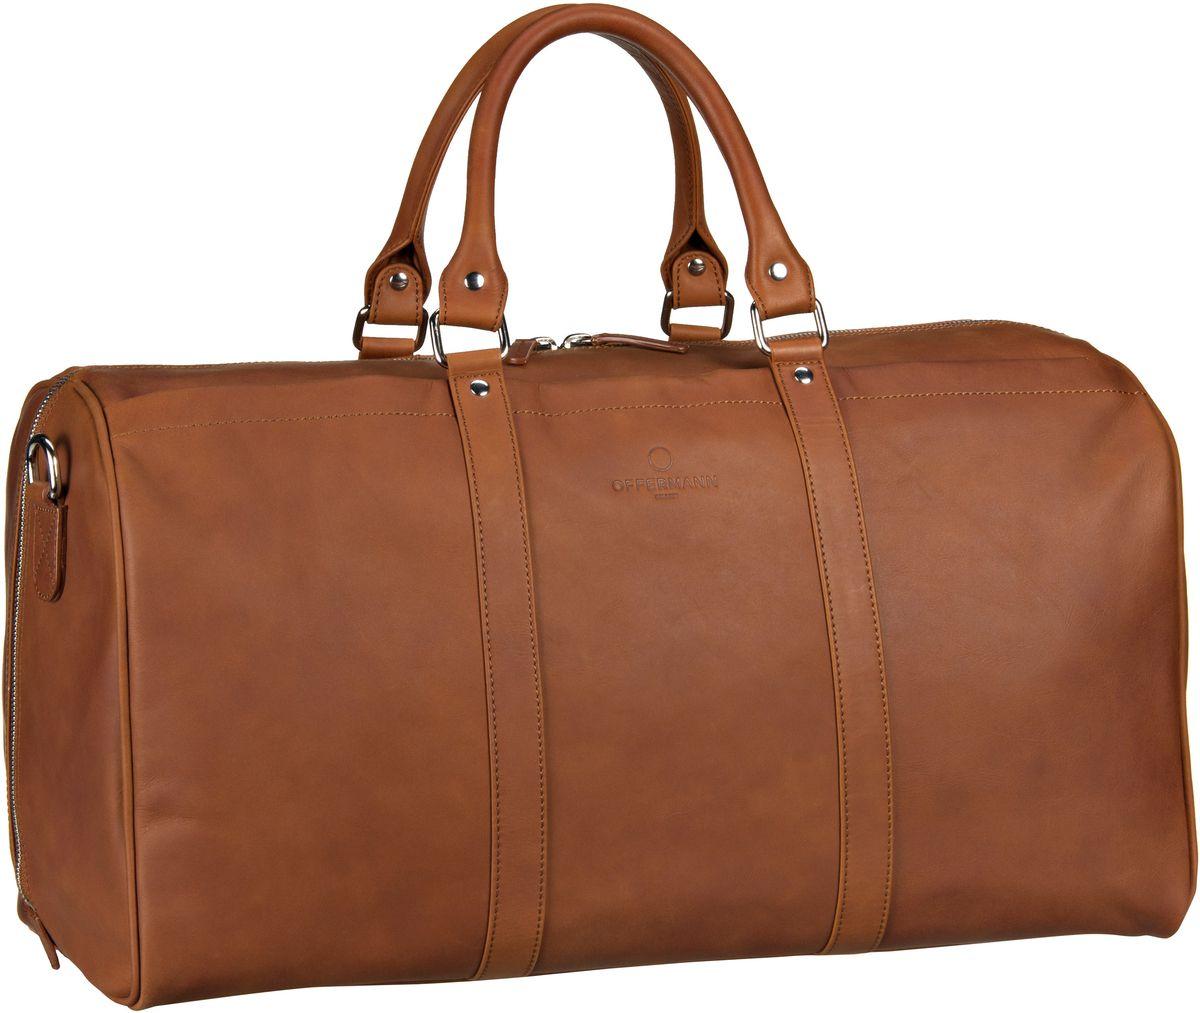 Offermann Duffle Bag Fine Cognac - Reisetasche